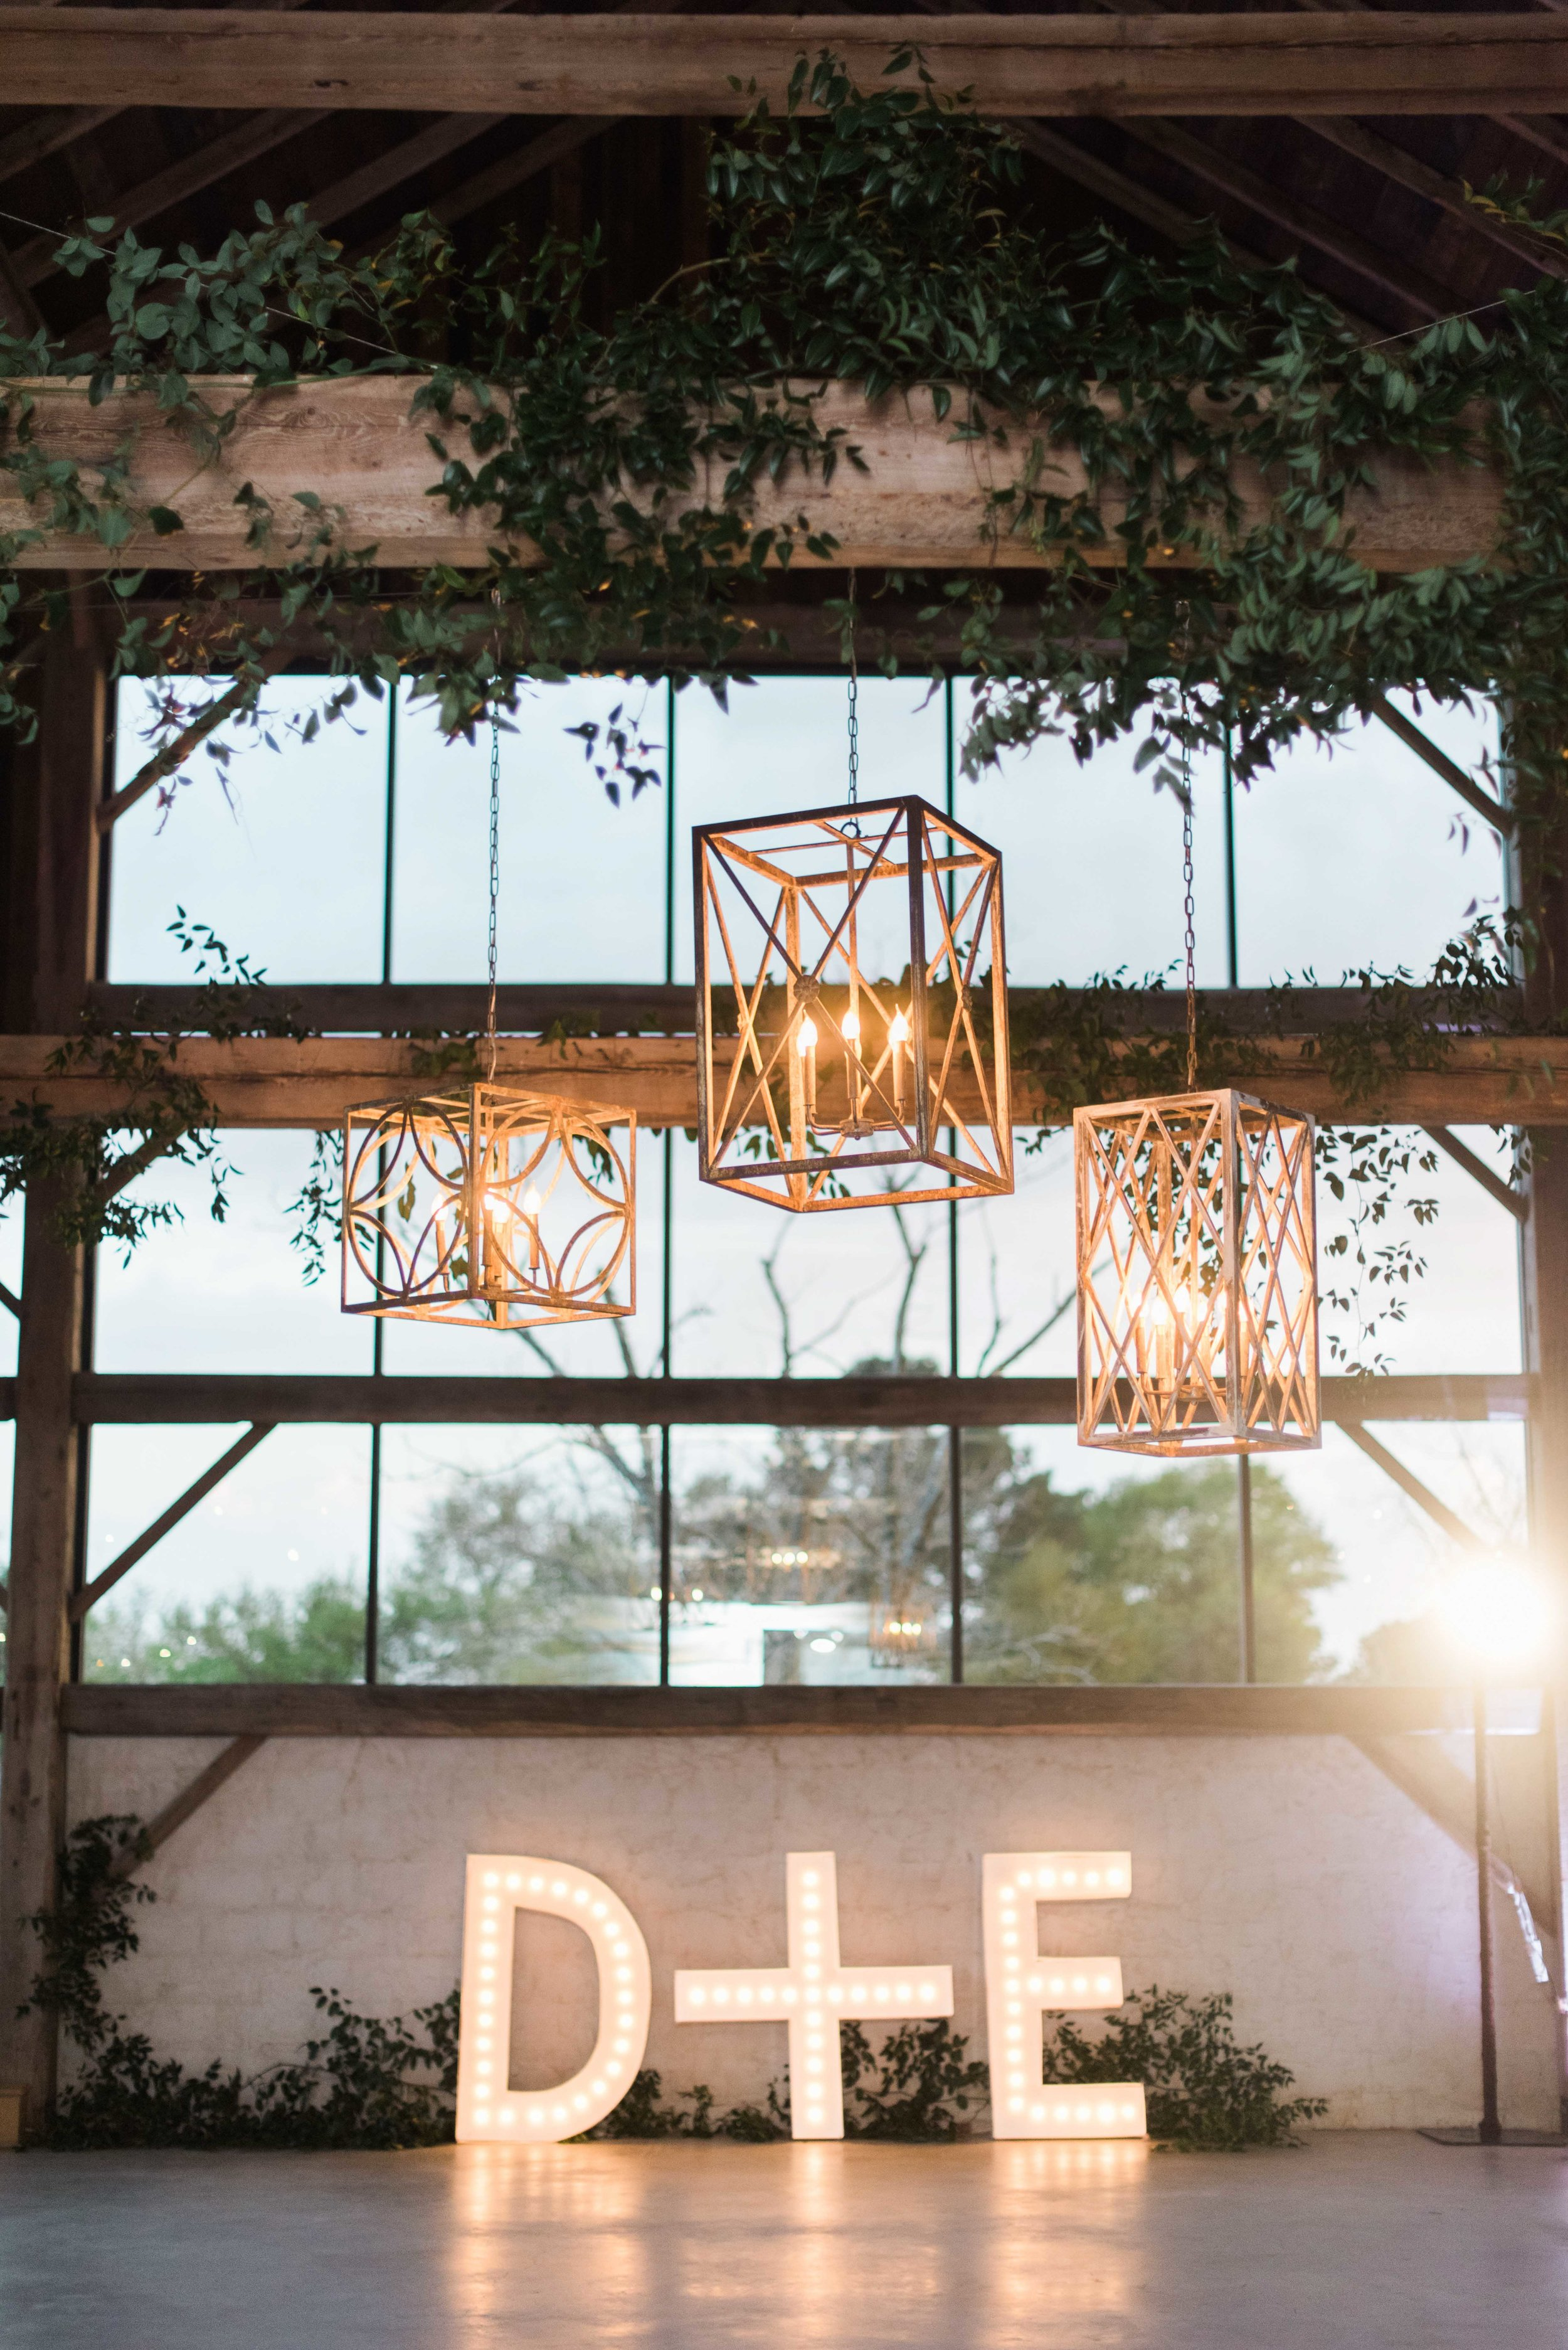 The-Knot-50-Weddings-50-States-Texas-Winner-Dana-Fernandez-photography-houston-wedding-photographer-film-fine-art-destination-41.jpg